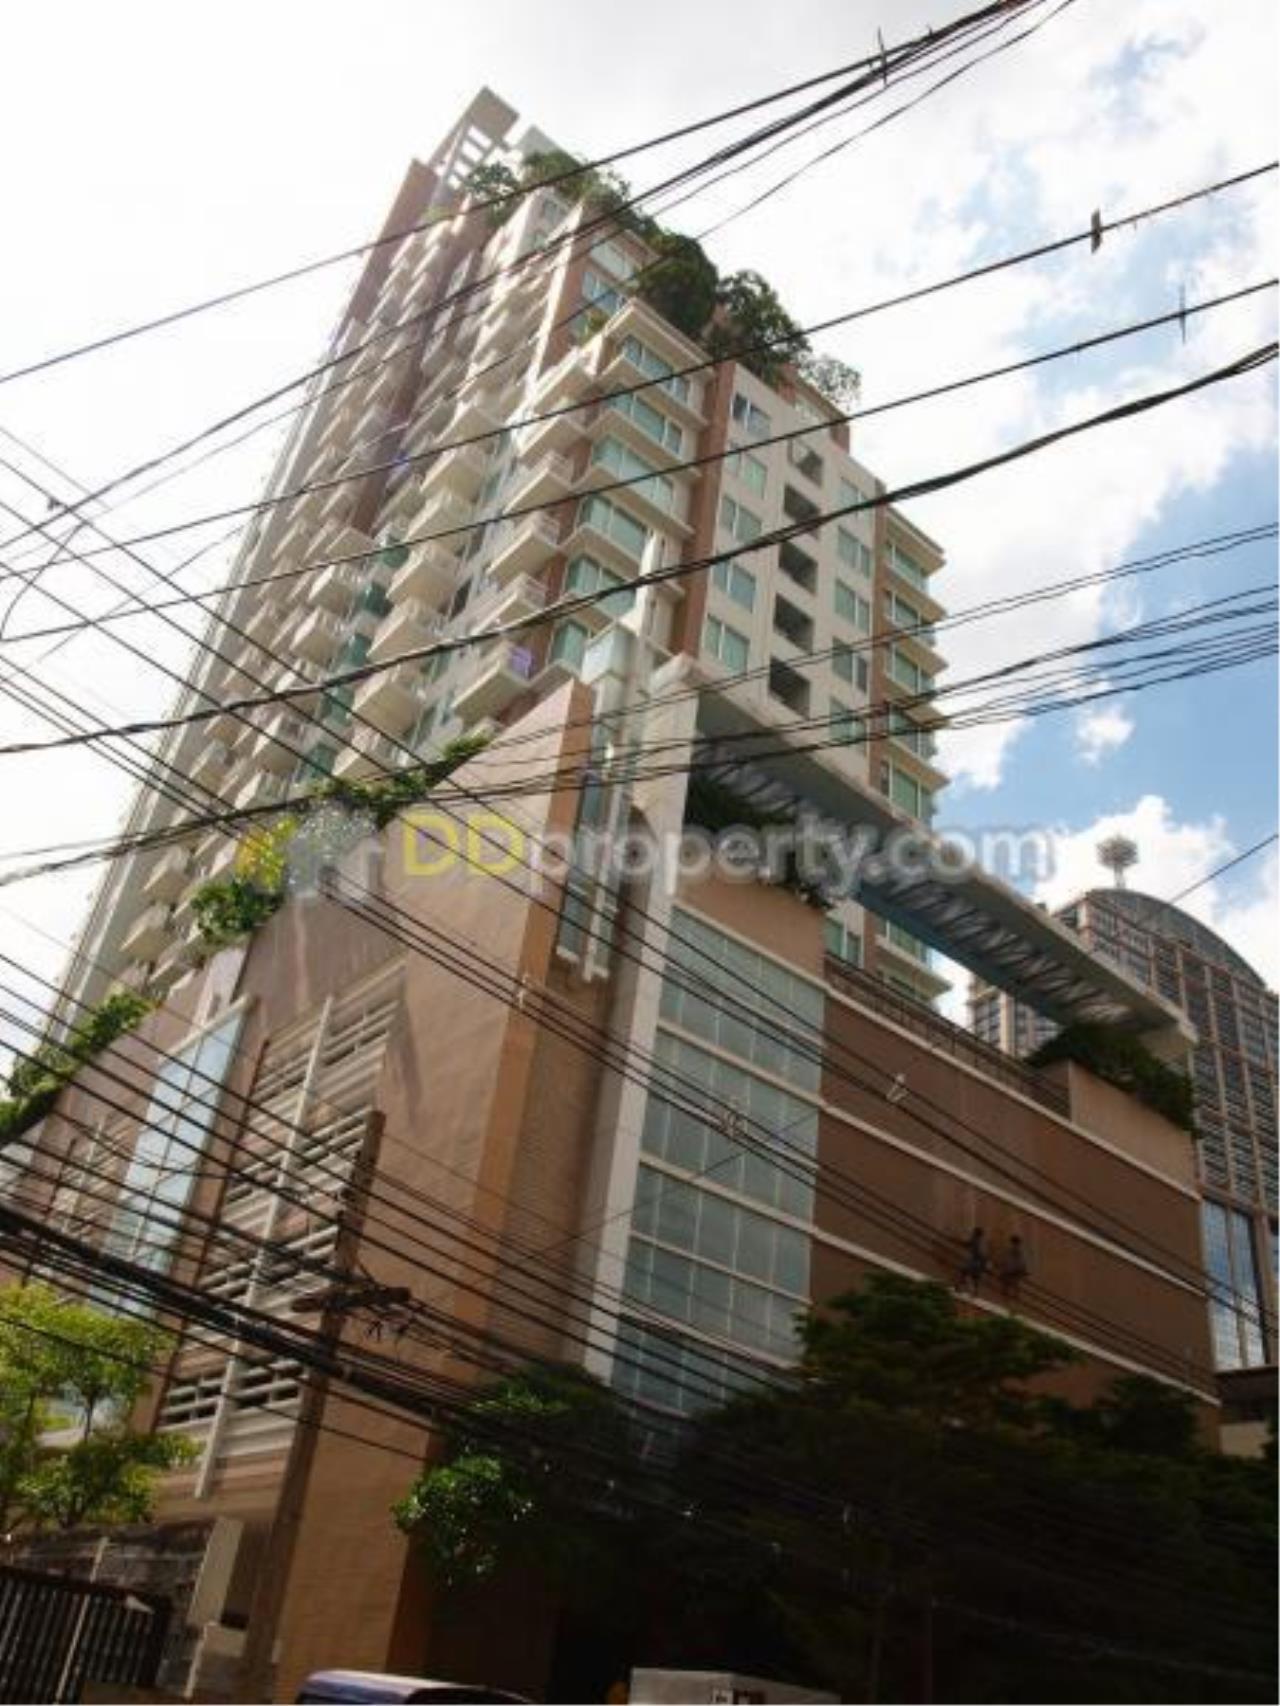 Quality Life Property Agency's ***R E N T*** ! SIRI RESIDENCE | 2 BED 2 BATH | 110 SQ. M. 4